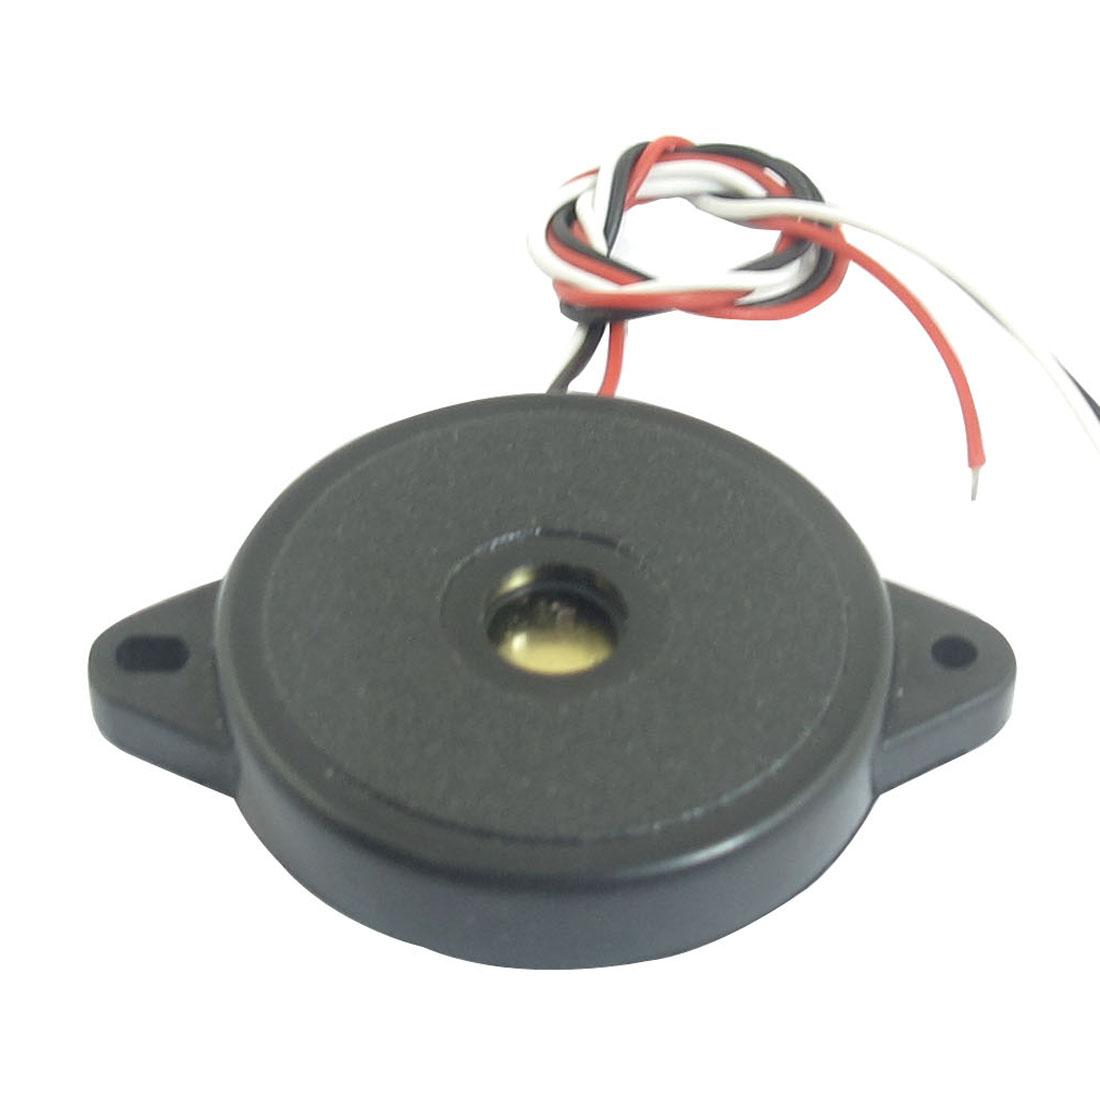 DC 30-40V Industrial Continuous Sound Electronic Alarm Buzzer Black